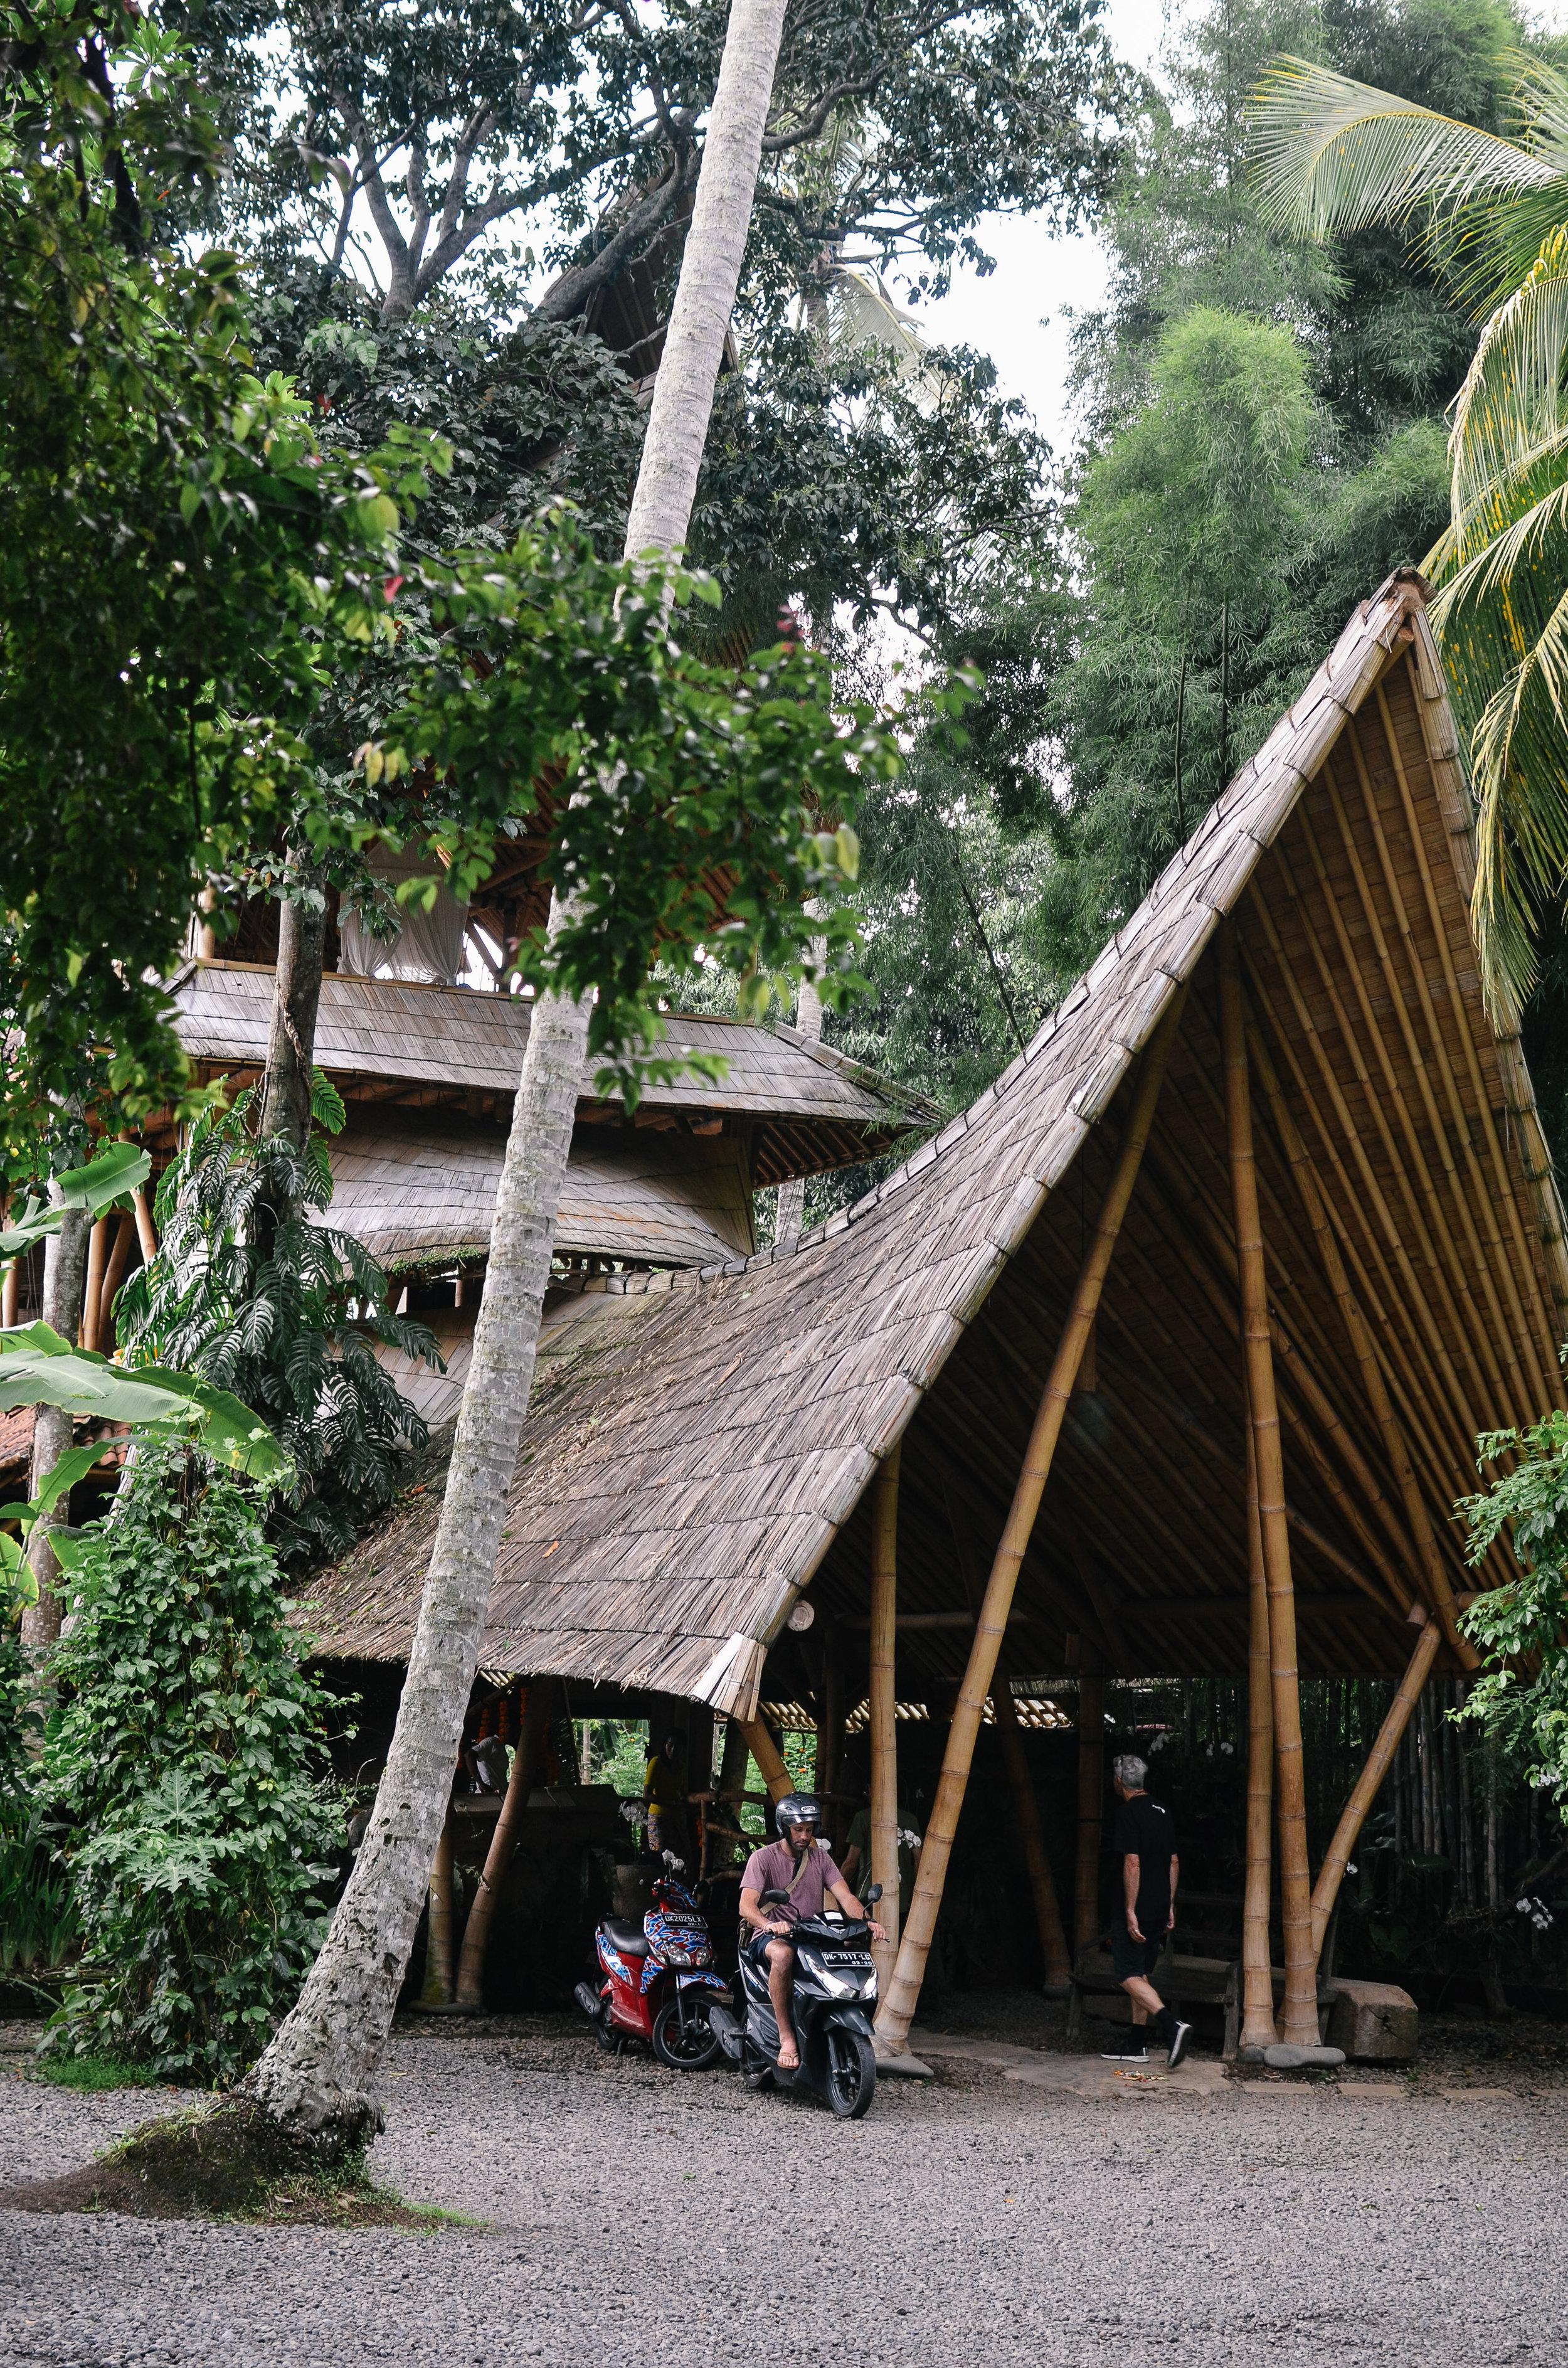 bali+mosca+bamboo+lodge+bali+ubud+lifeonpine_DSC_2890.jpg